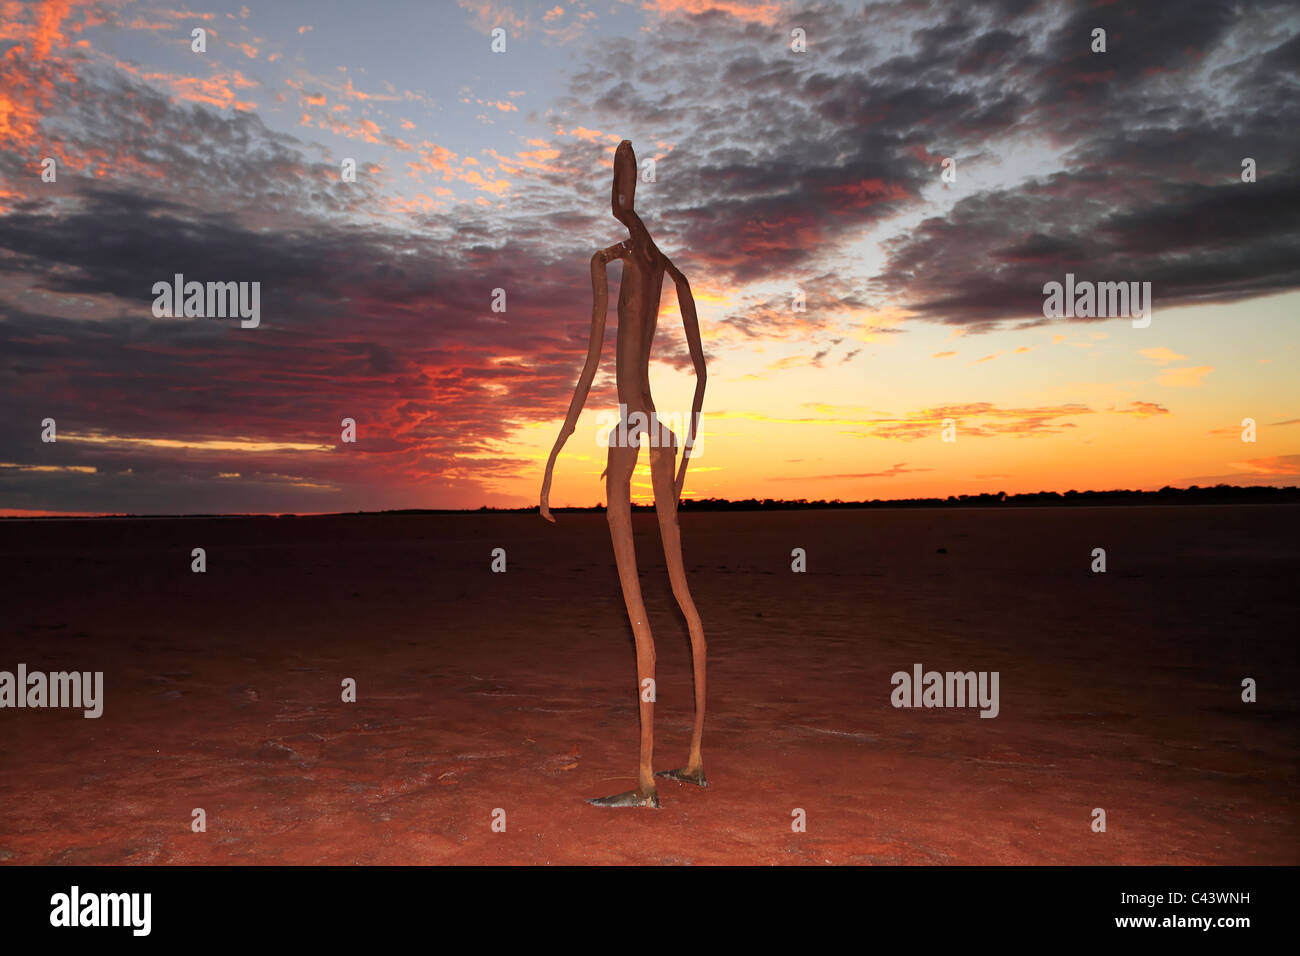 Sculpture by Antony Gormley, Inside Australia exhibition, on Lake Ballard at sunrise, Western Australia - Stock Image